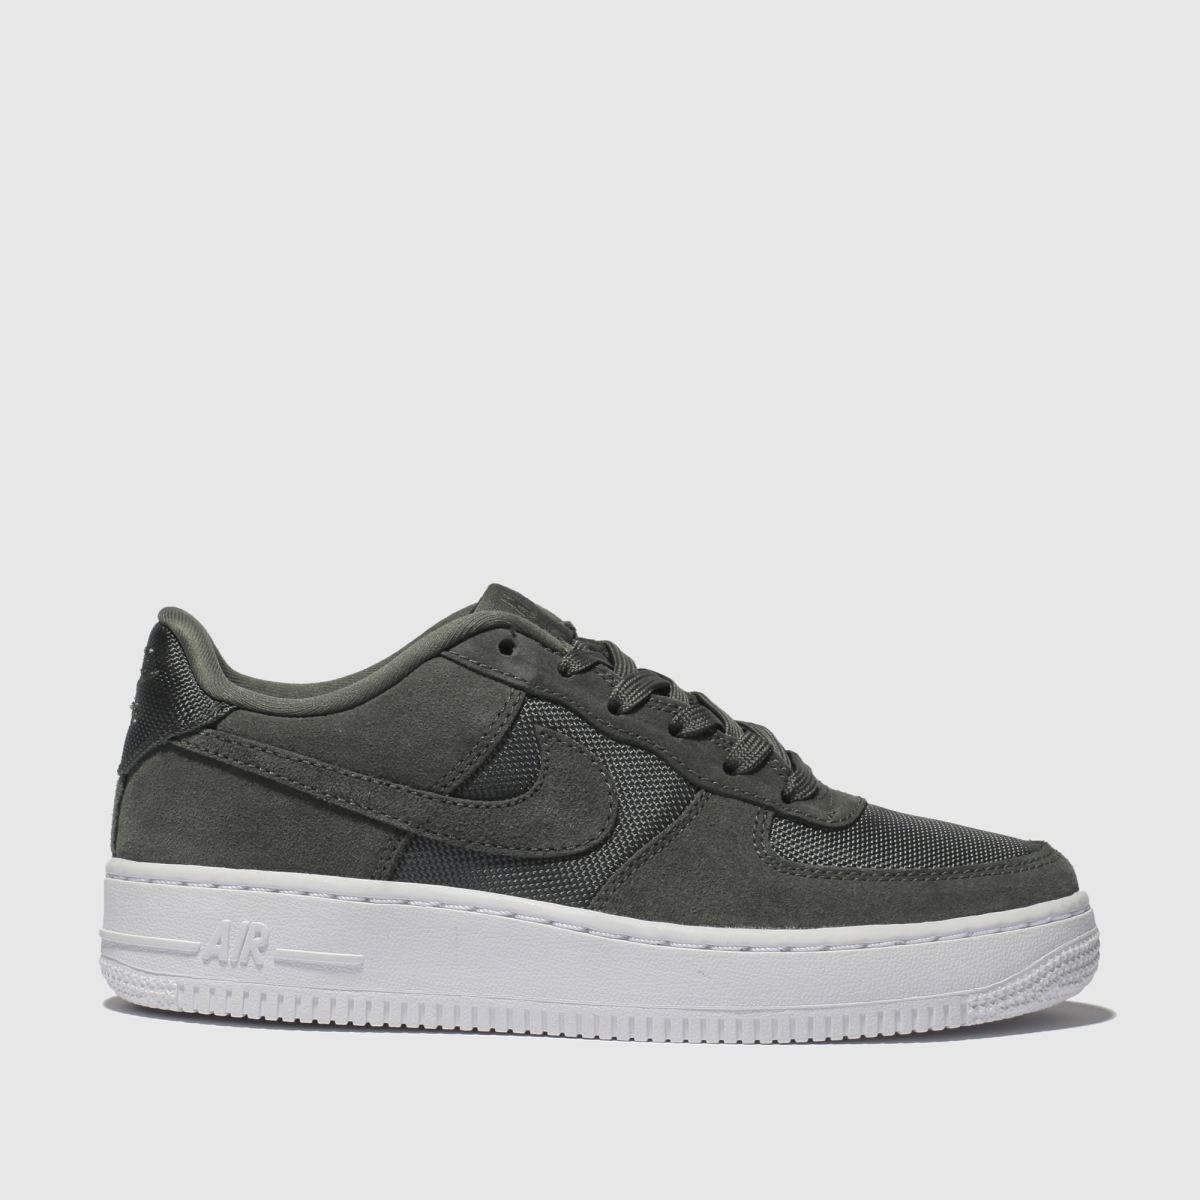 Nike Khaki Air Force 1-1 Trainers Youth